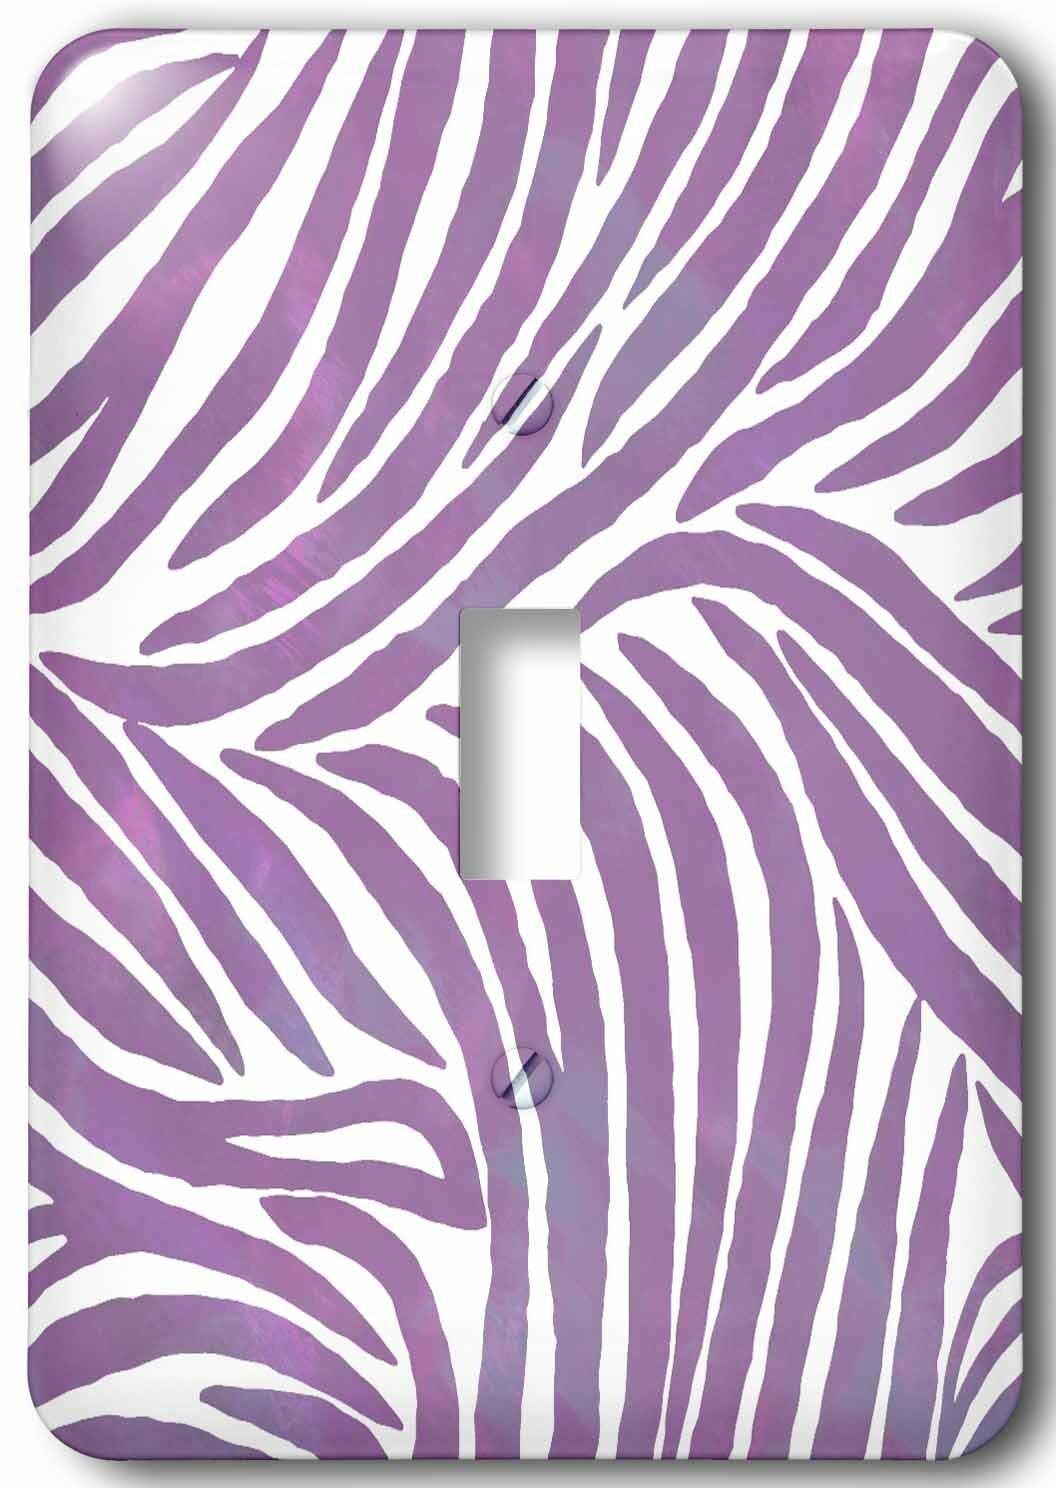 3drose Zebra 1 Gang Toggle Light Switch Wall Plate Wayfair